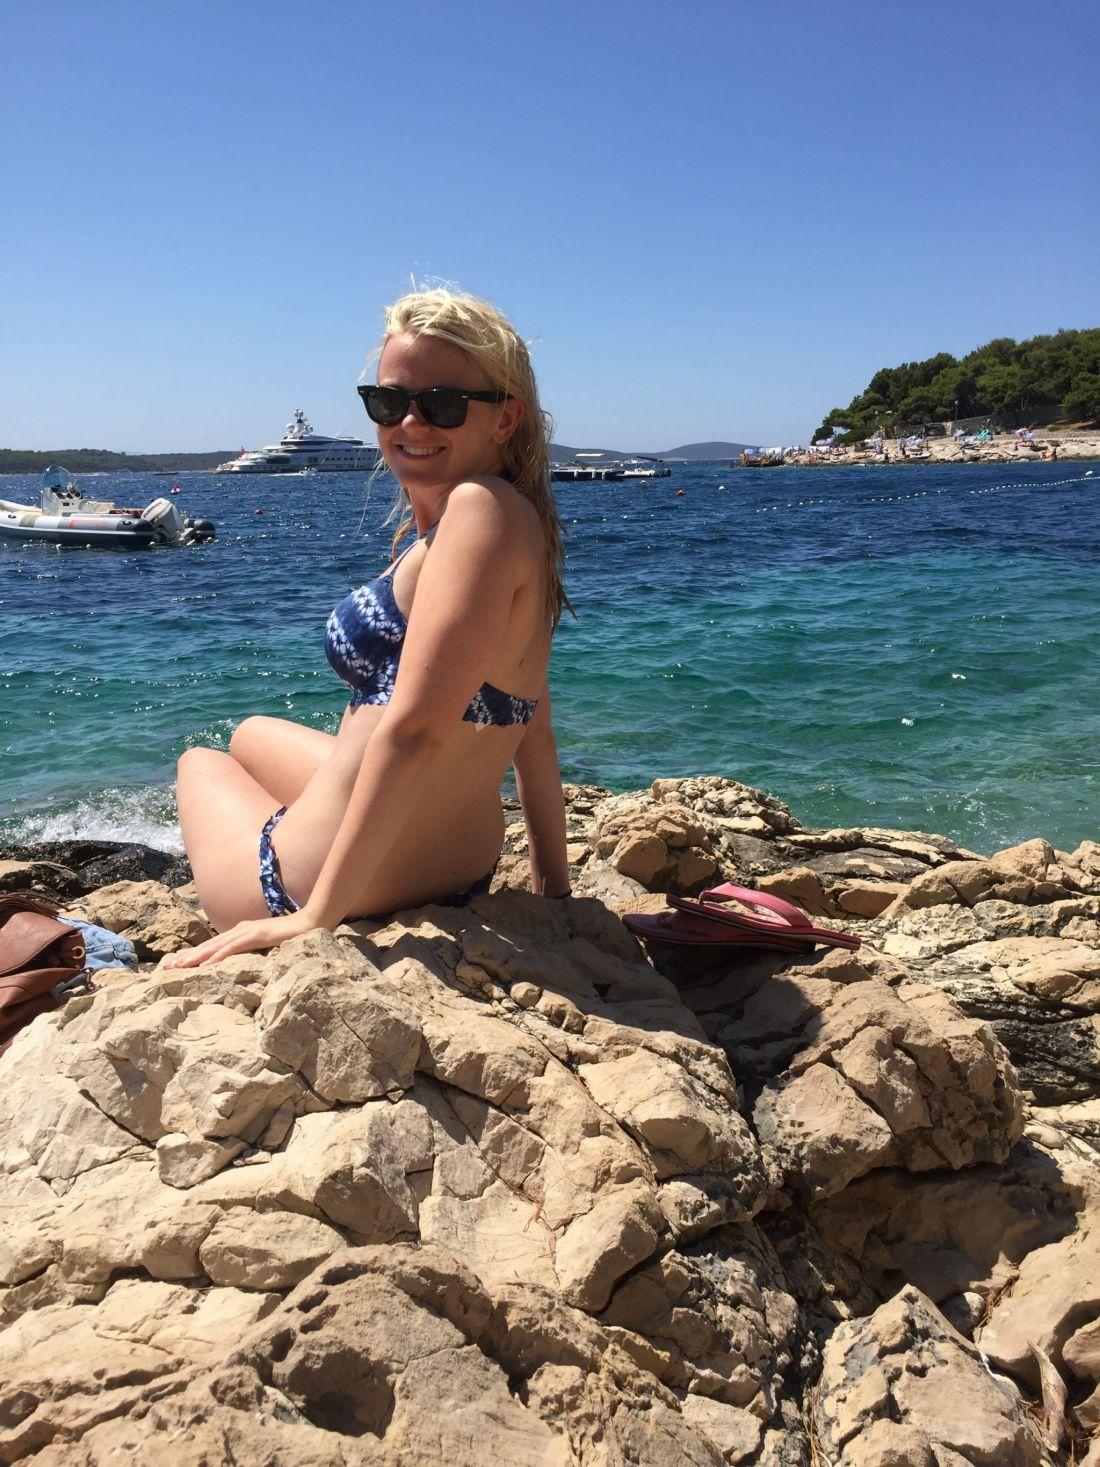 Sunbathing next to the Adriatic Sea, Croatia